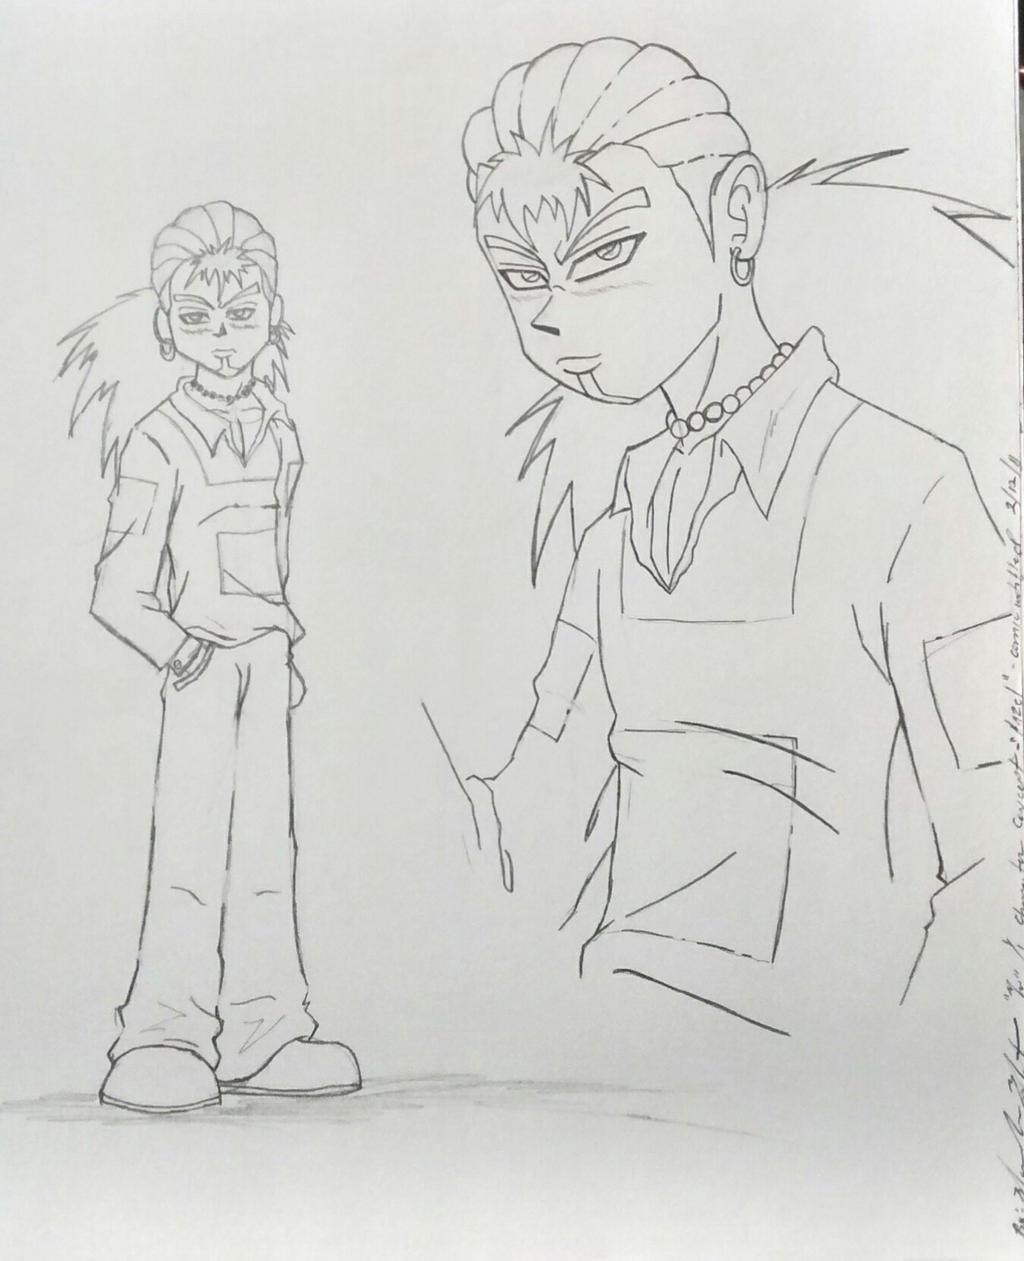 By TashyneArt Manga Character Design (Bad Guy/Good Guy?) By TashyneArt